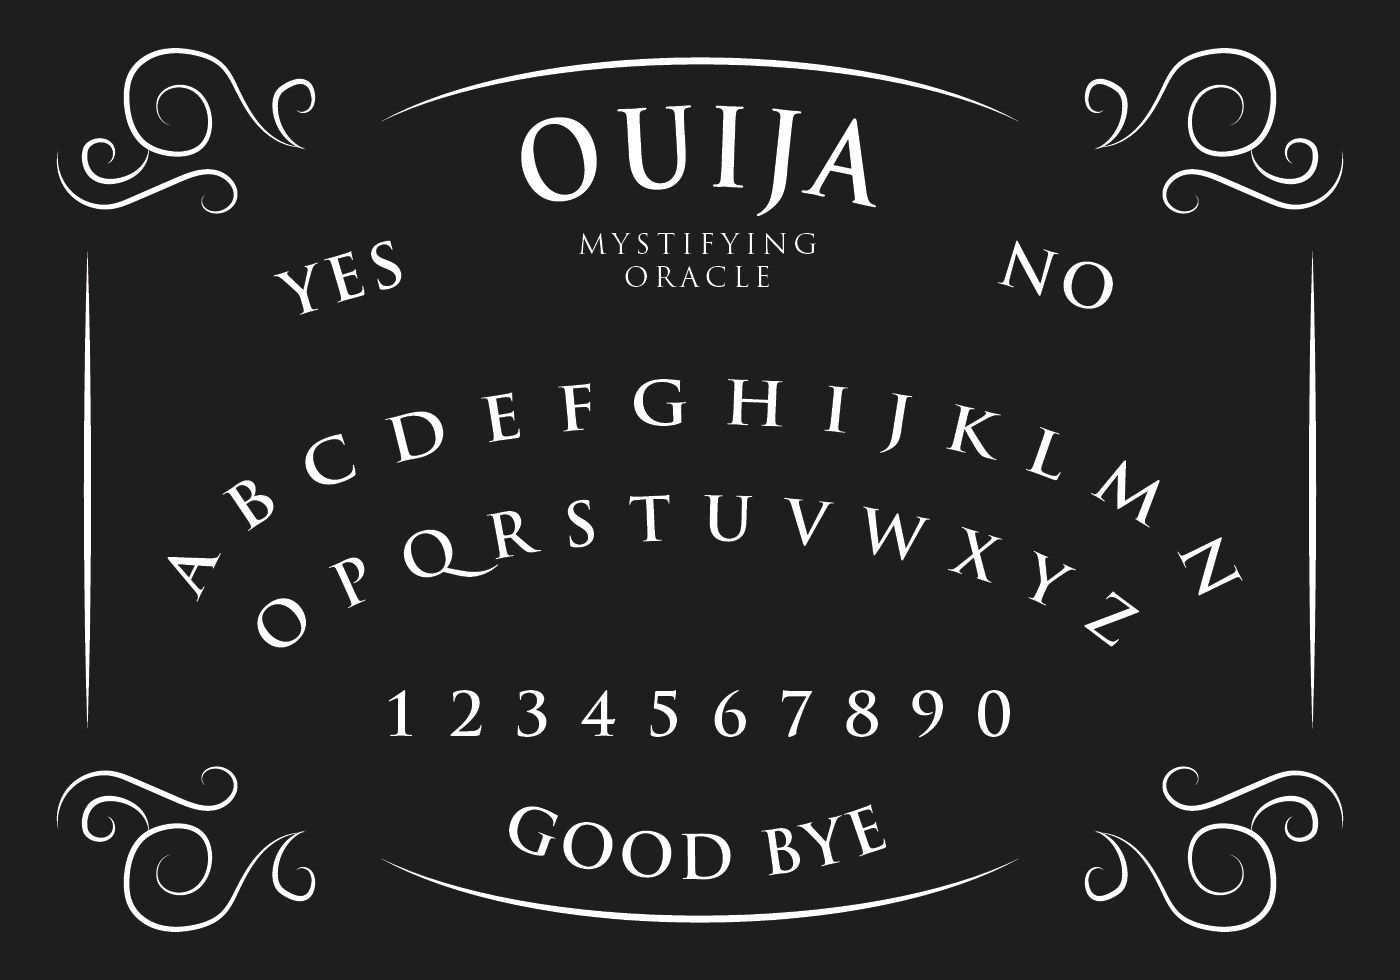 Ouija Board Ouija Ouija Board Quija Board